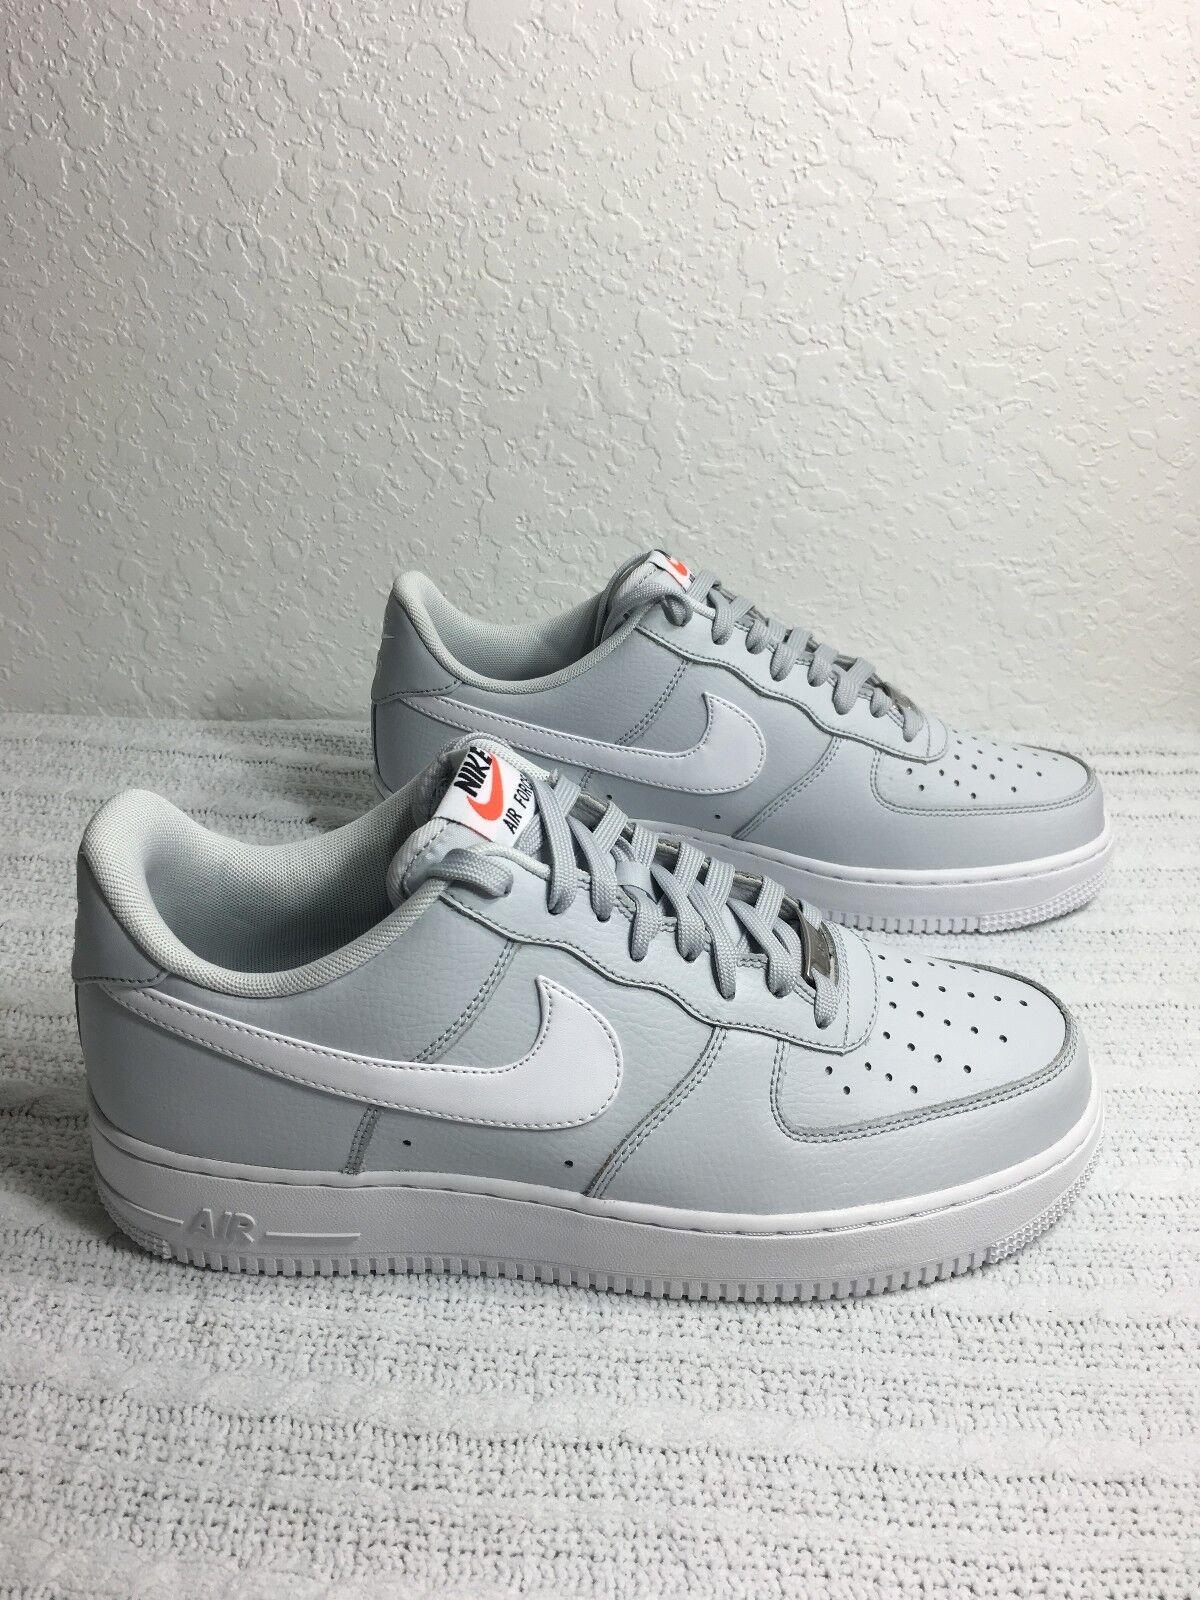 Nike air force 1 bianchi disco di platino / bianchi 1 dimensioni 9.5 nuovi 488298 091 4ecdc1